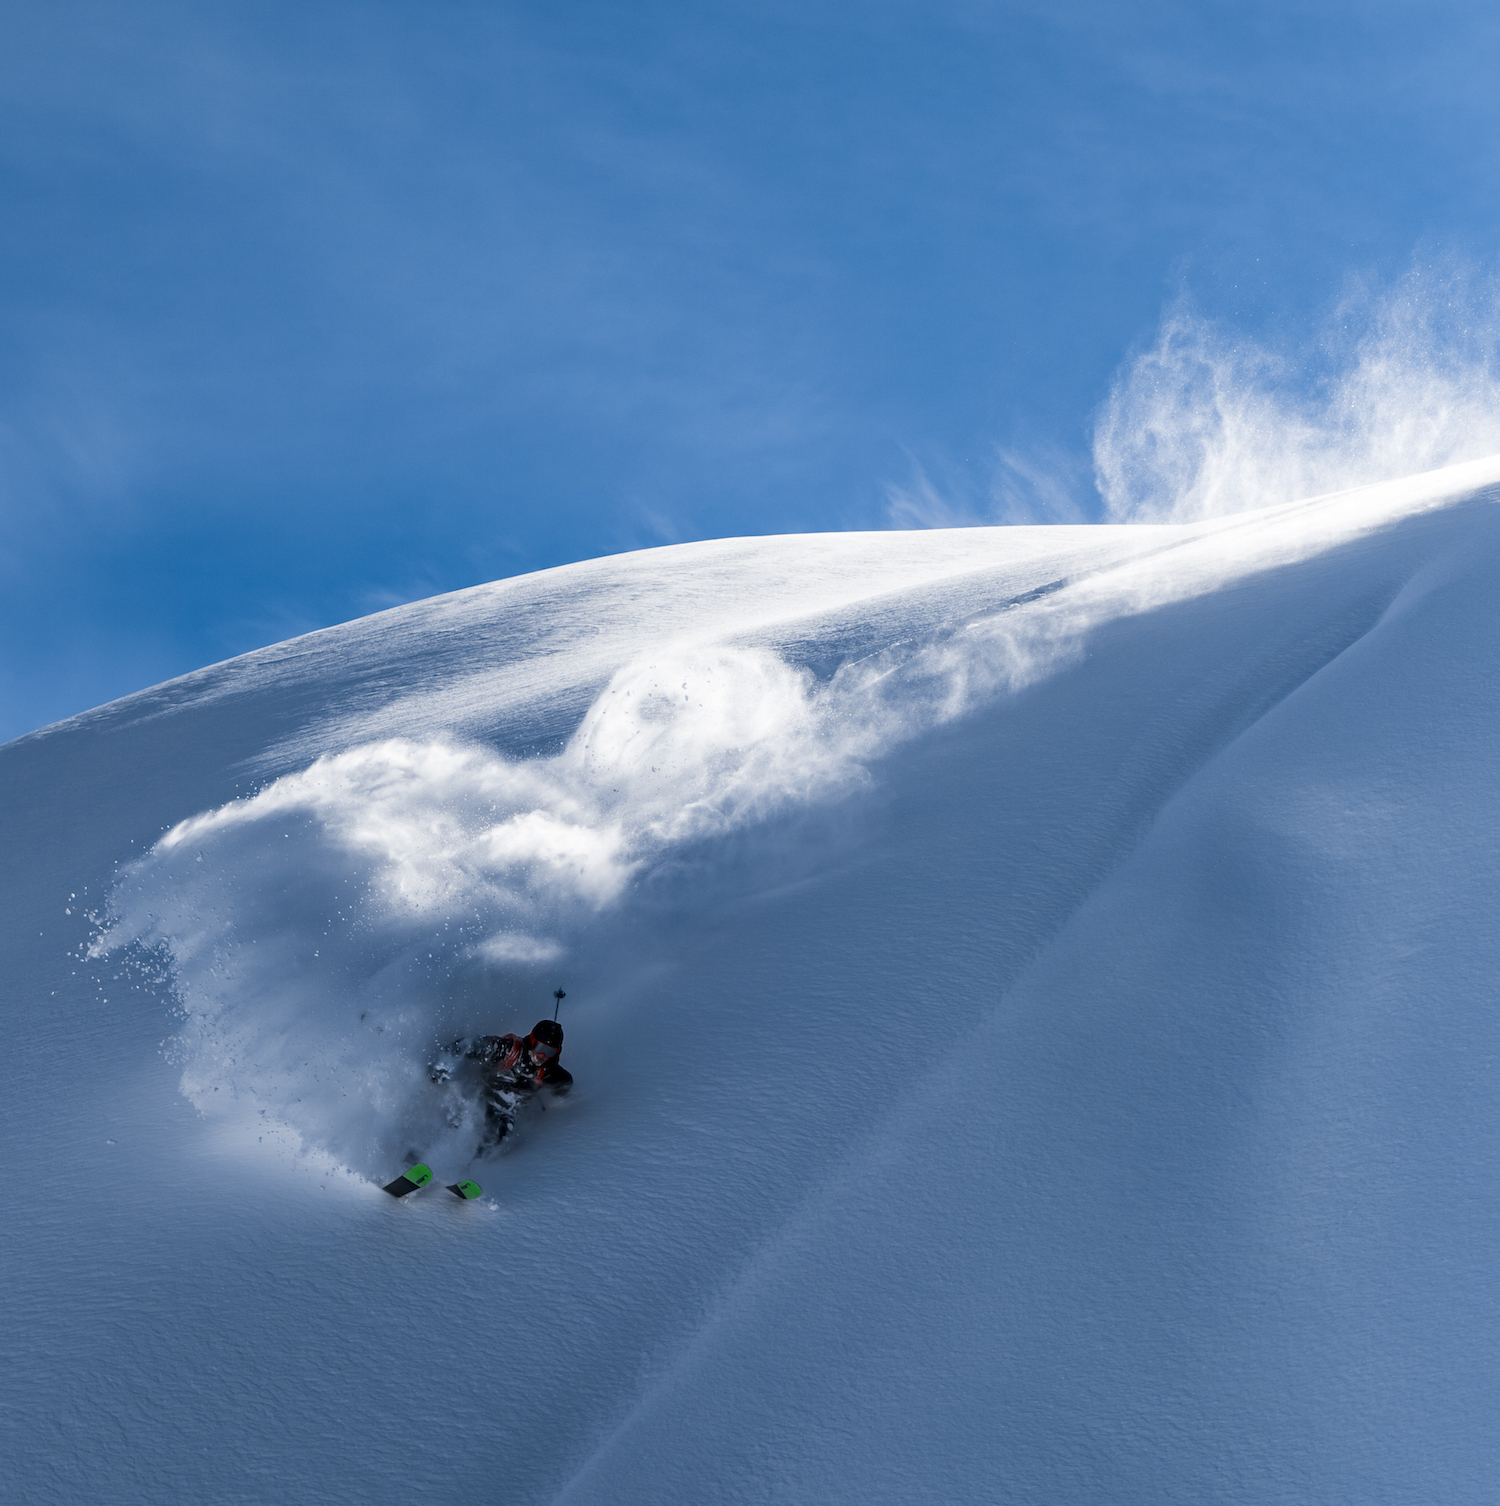 Elias Dad going full Throttle in the snow.